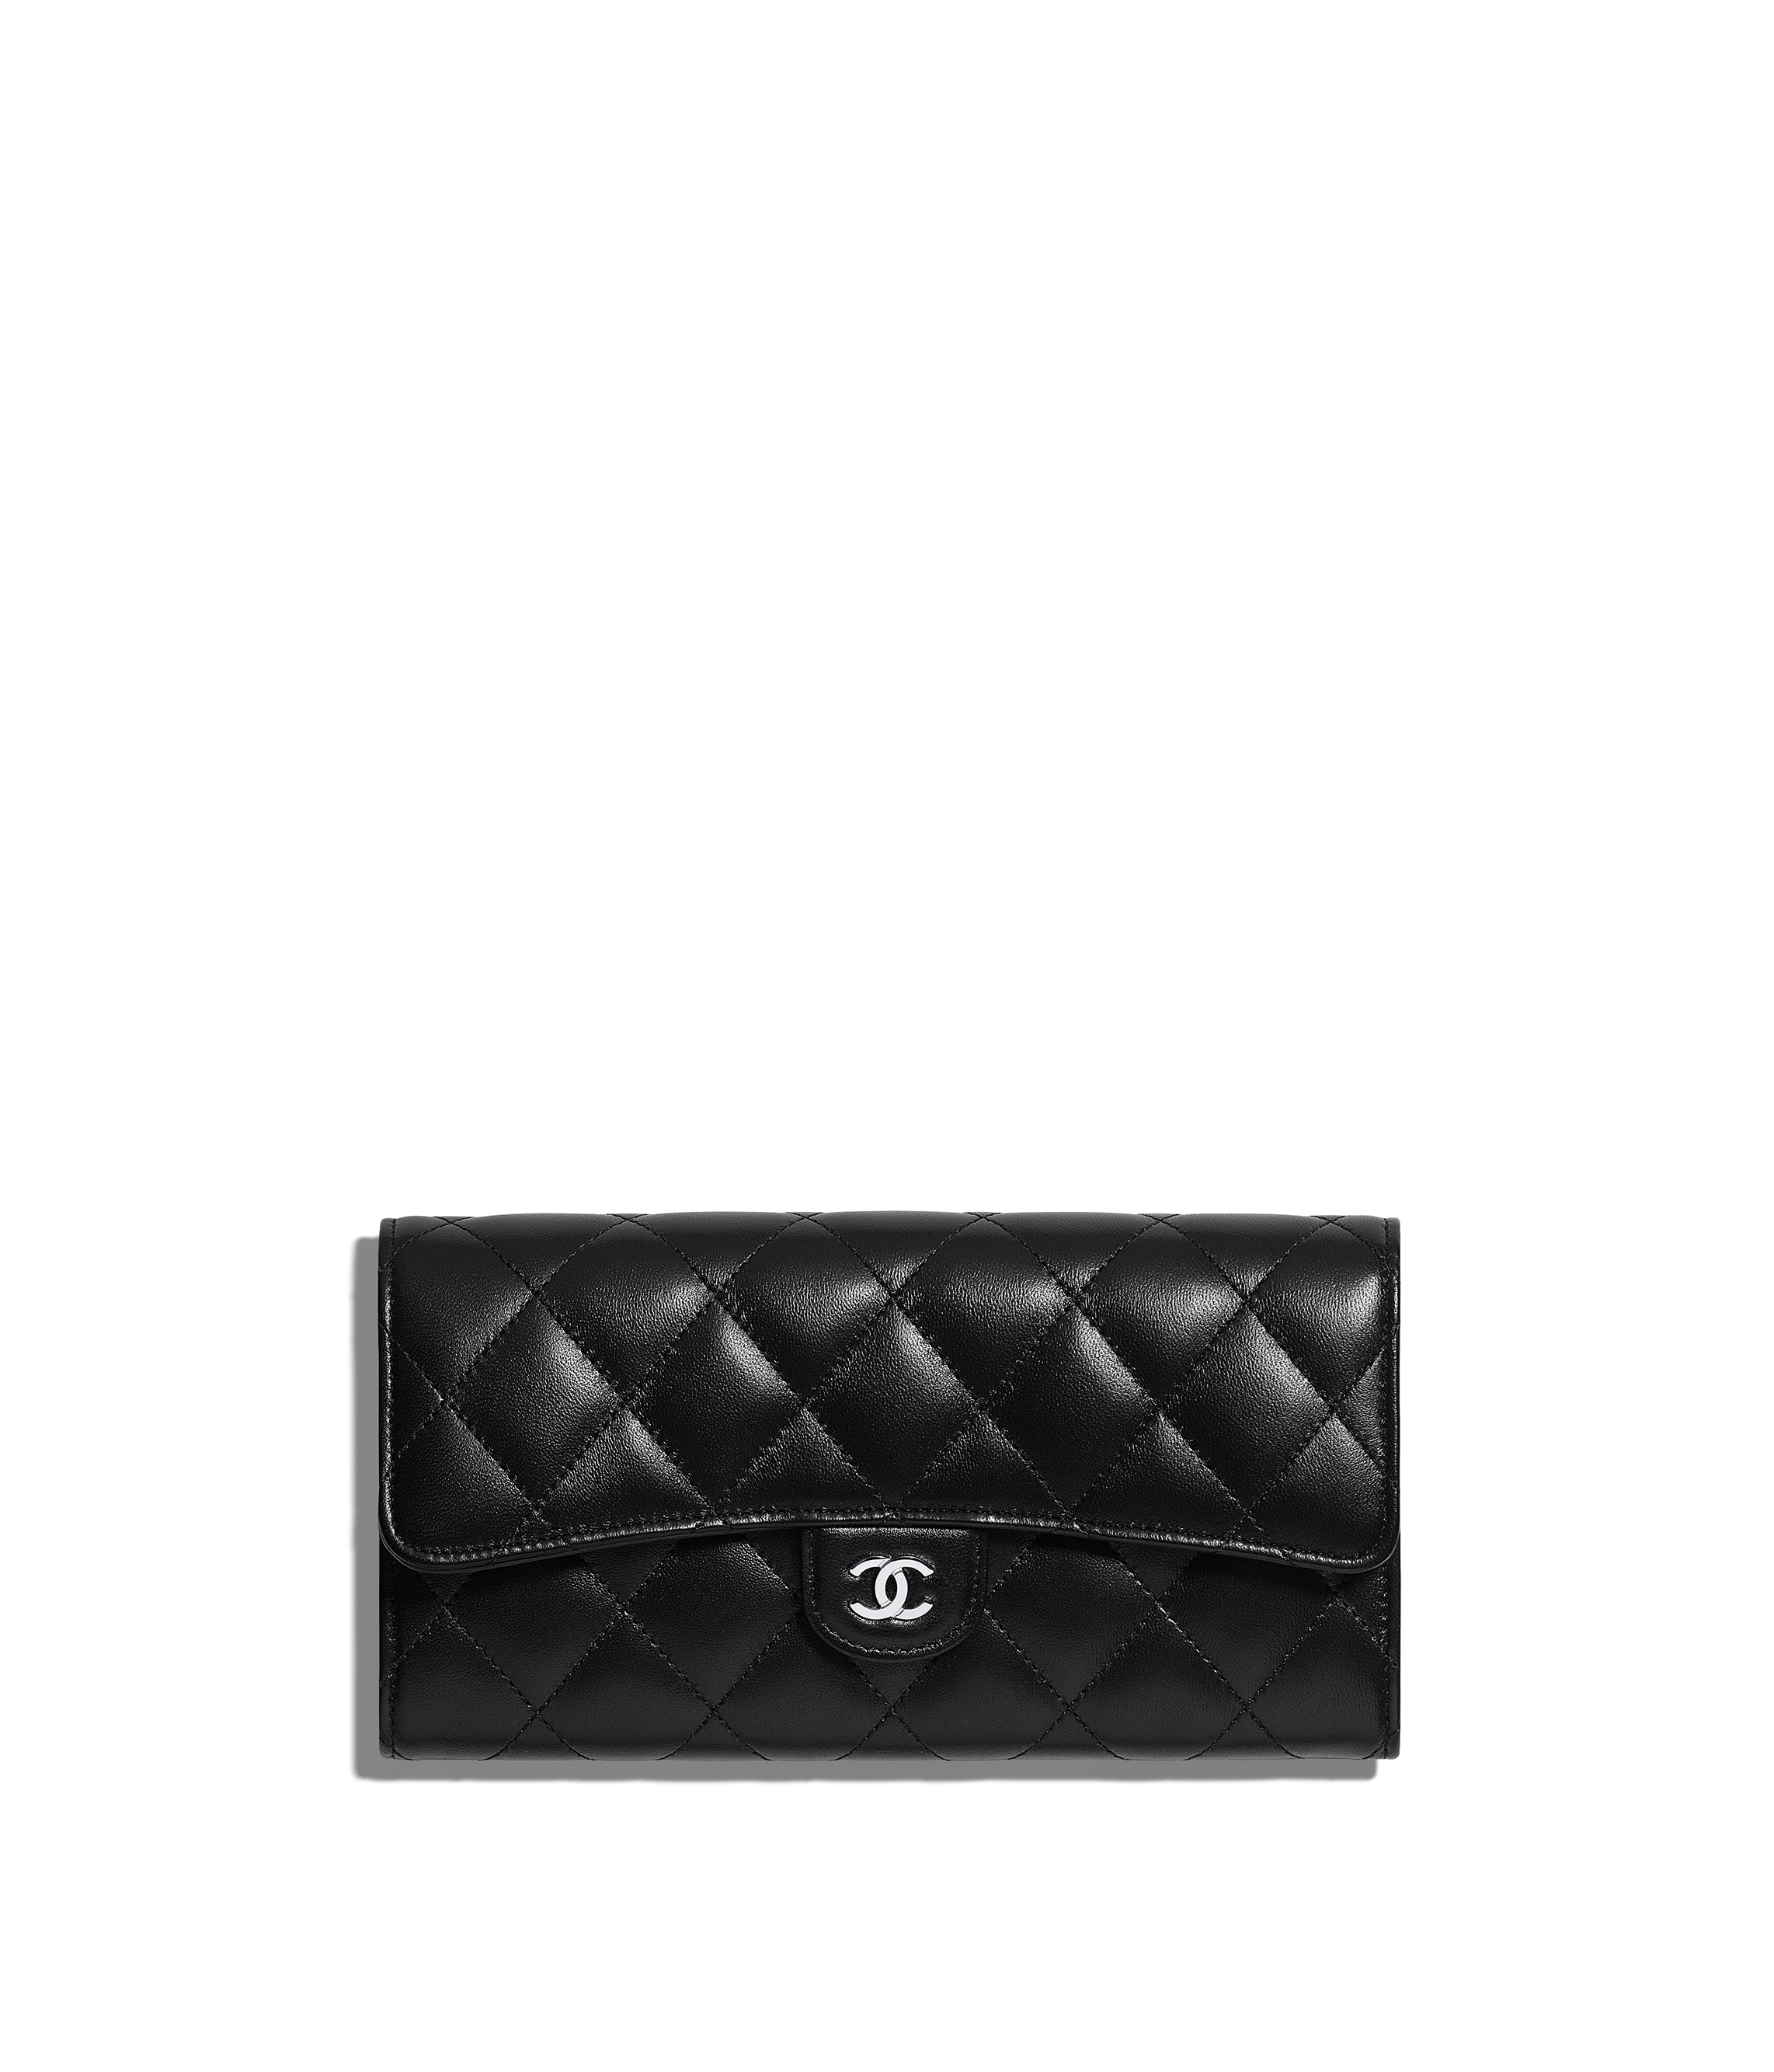 3ea438e2e60dfe Classic Long Flap Wallet, lambskin & silver-tone metal, black - CHANEL